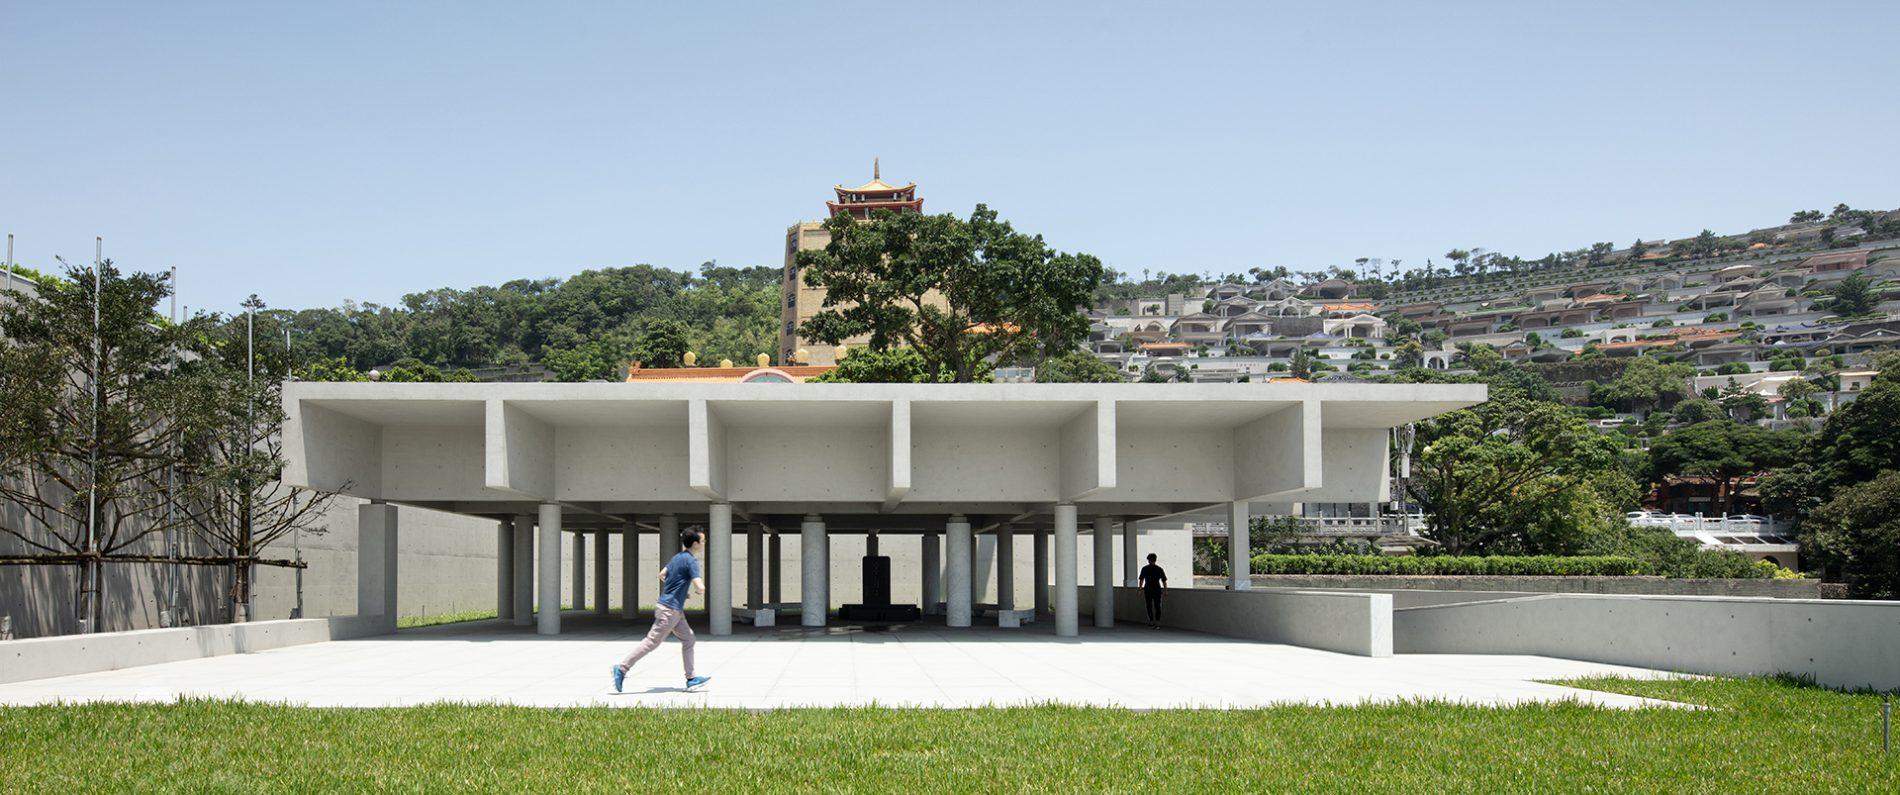 Chia Ching Mausoleum